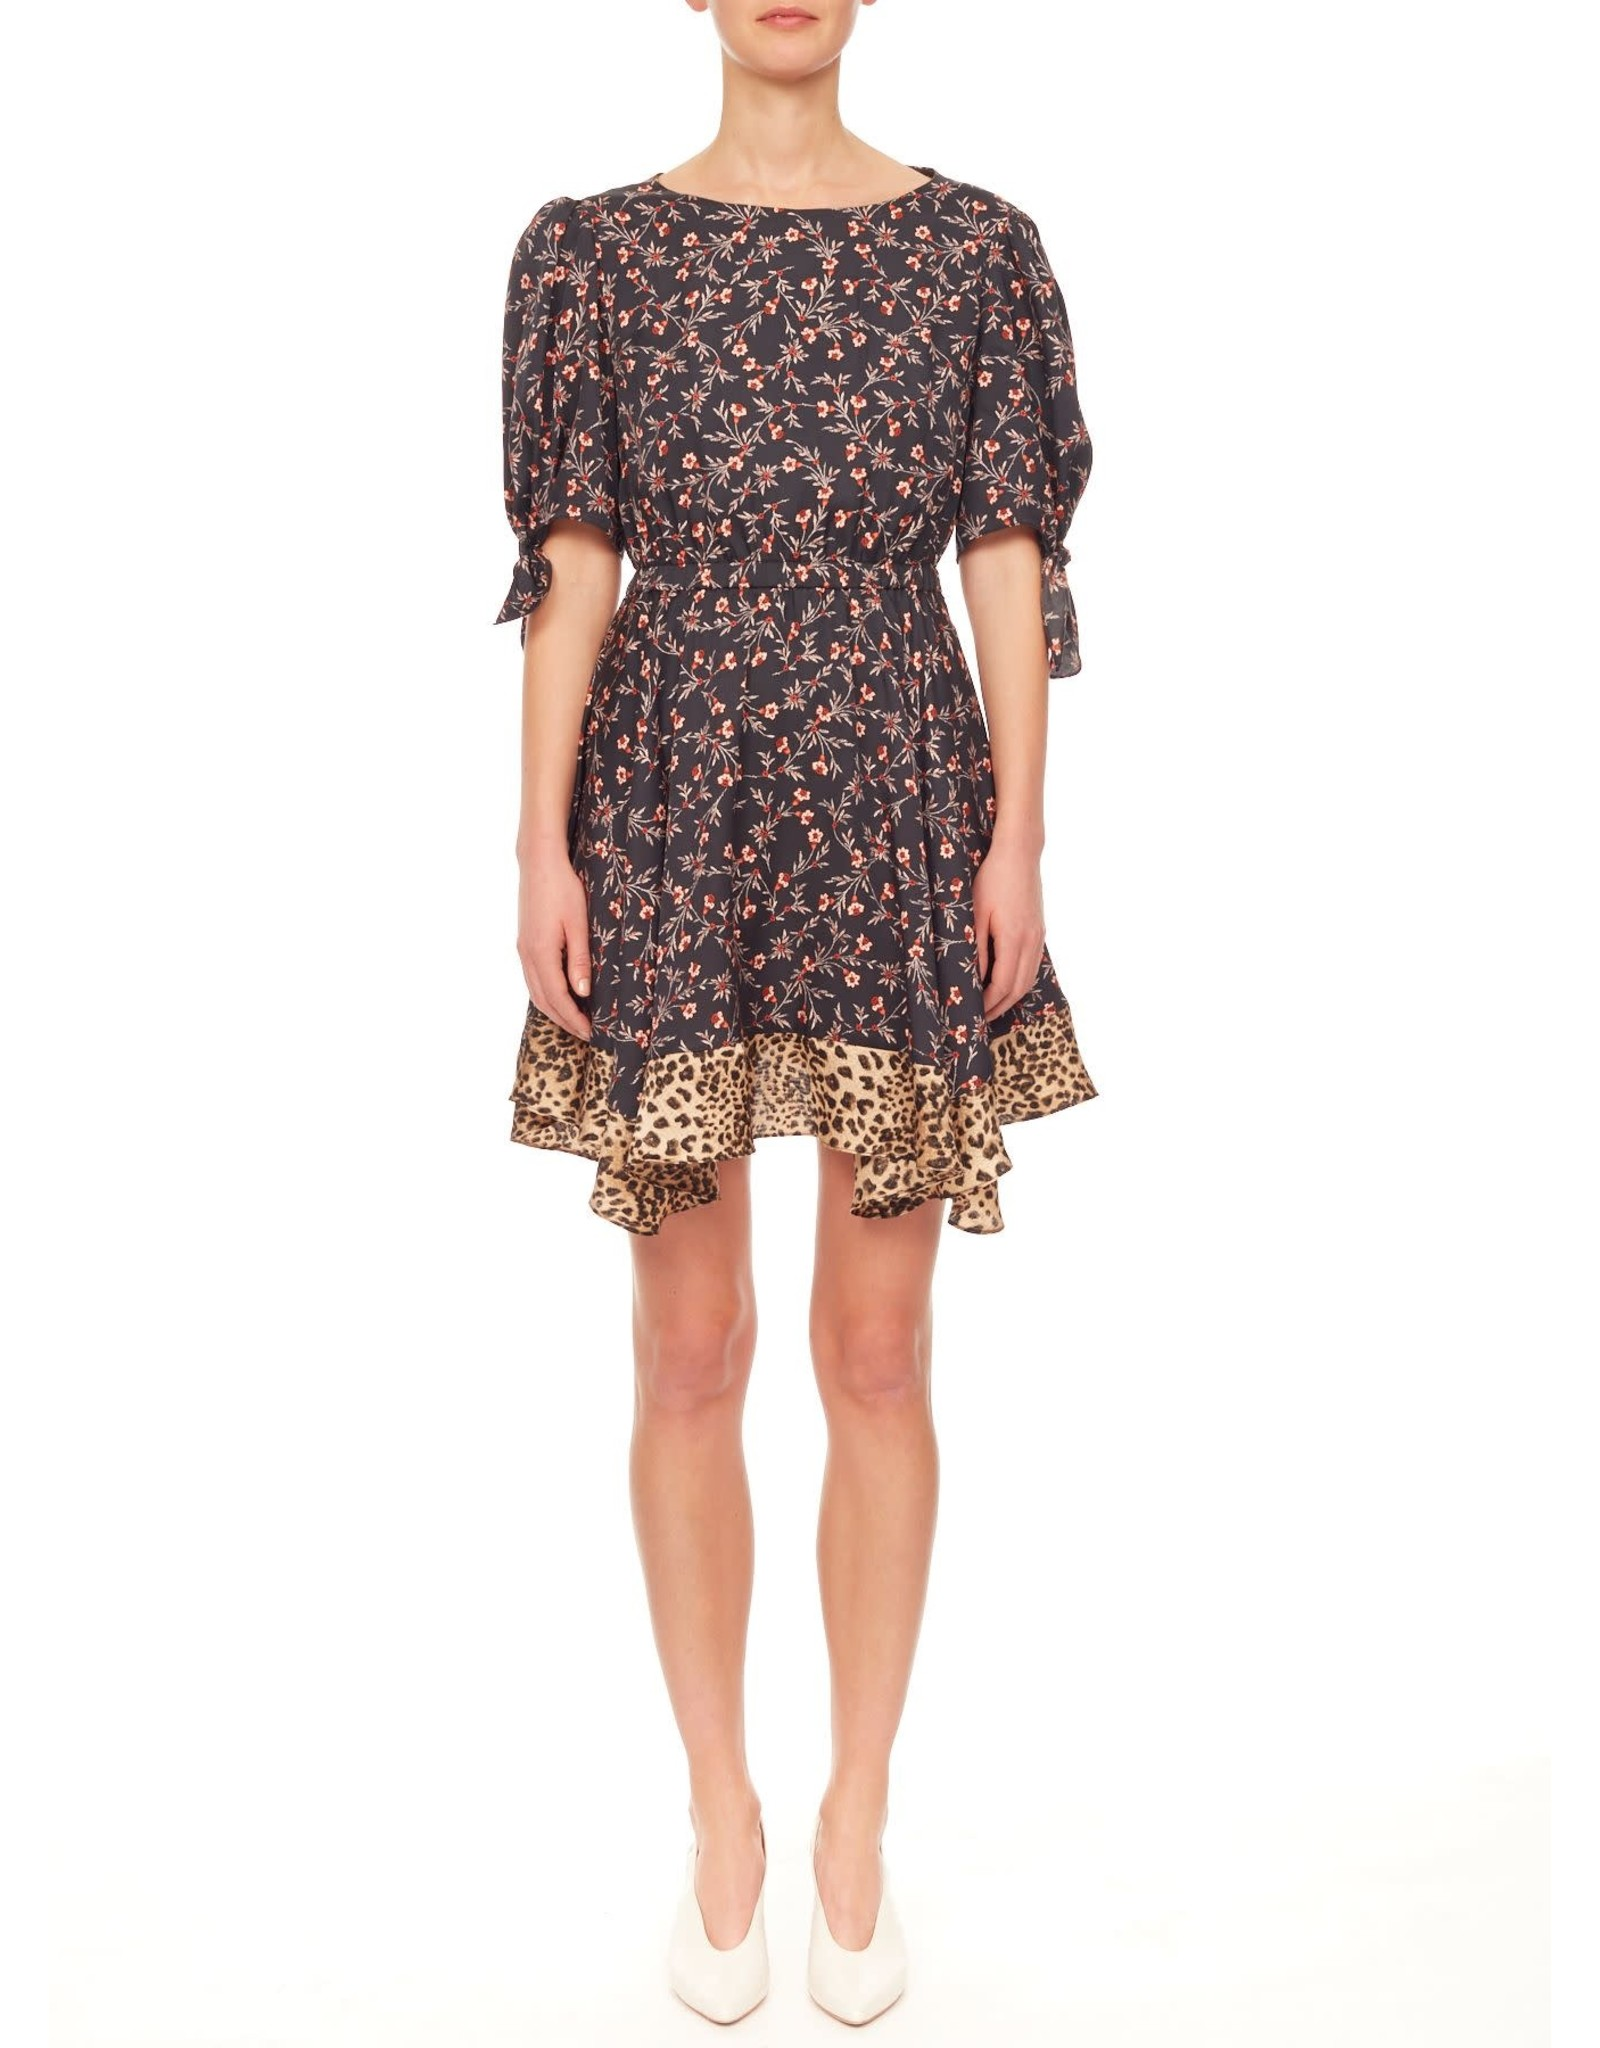 REBECCA TAYLOR S/S Lia Floral Dress